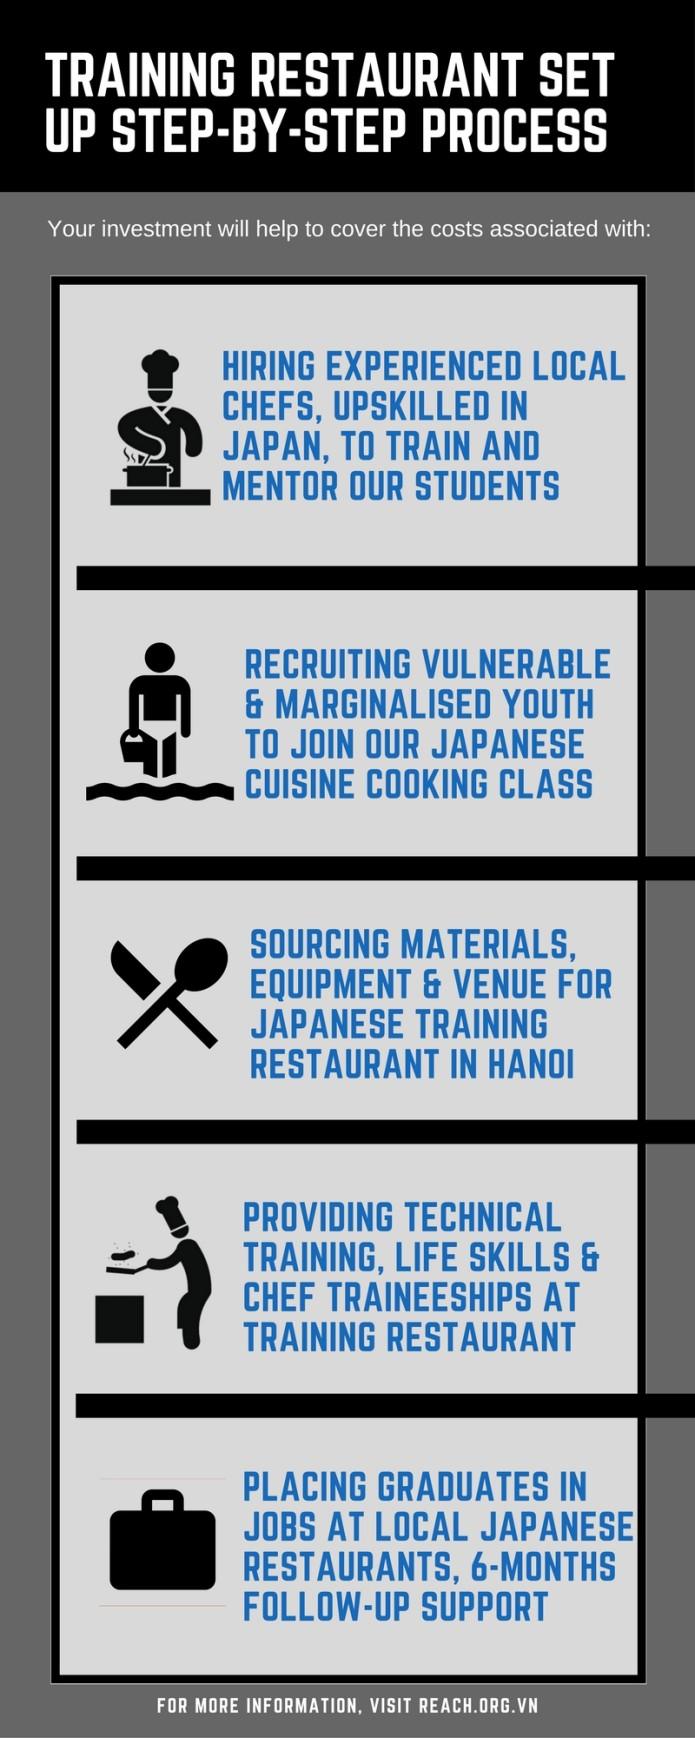 World-class Japanese training restaurant in Hanoi | Indiegogo